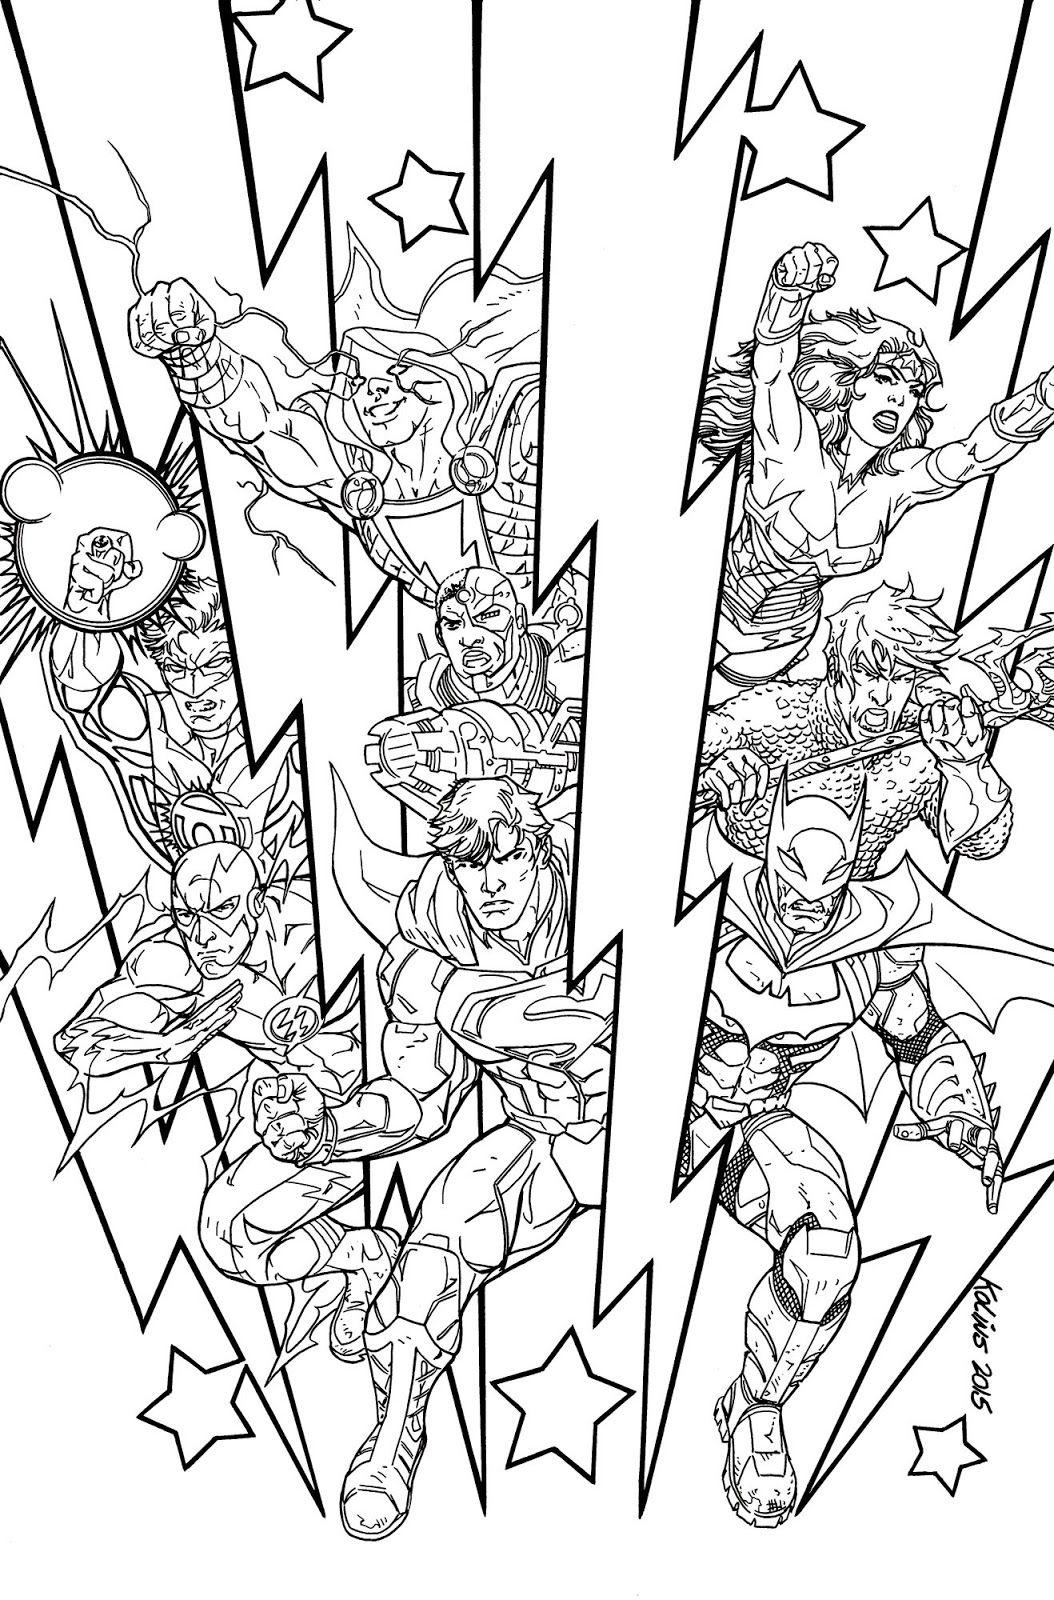 Justice League Fan Art Justice League Darkseid War Act Three Gods Of Justice Chapter 2 Superhero Coloring Pages Superhero Coloring Coloring Pages